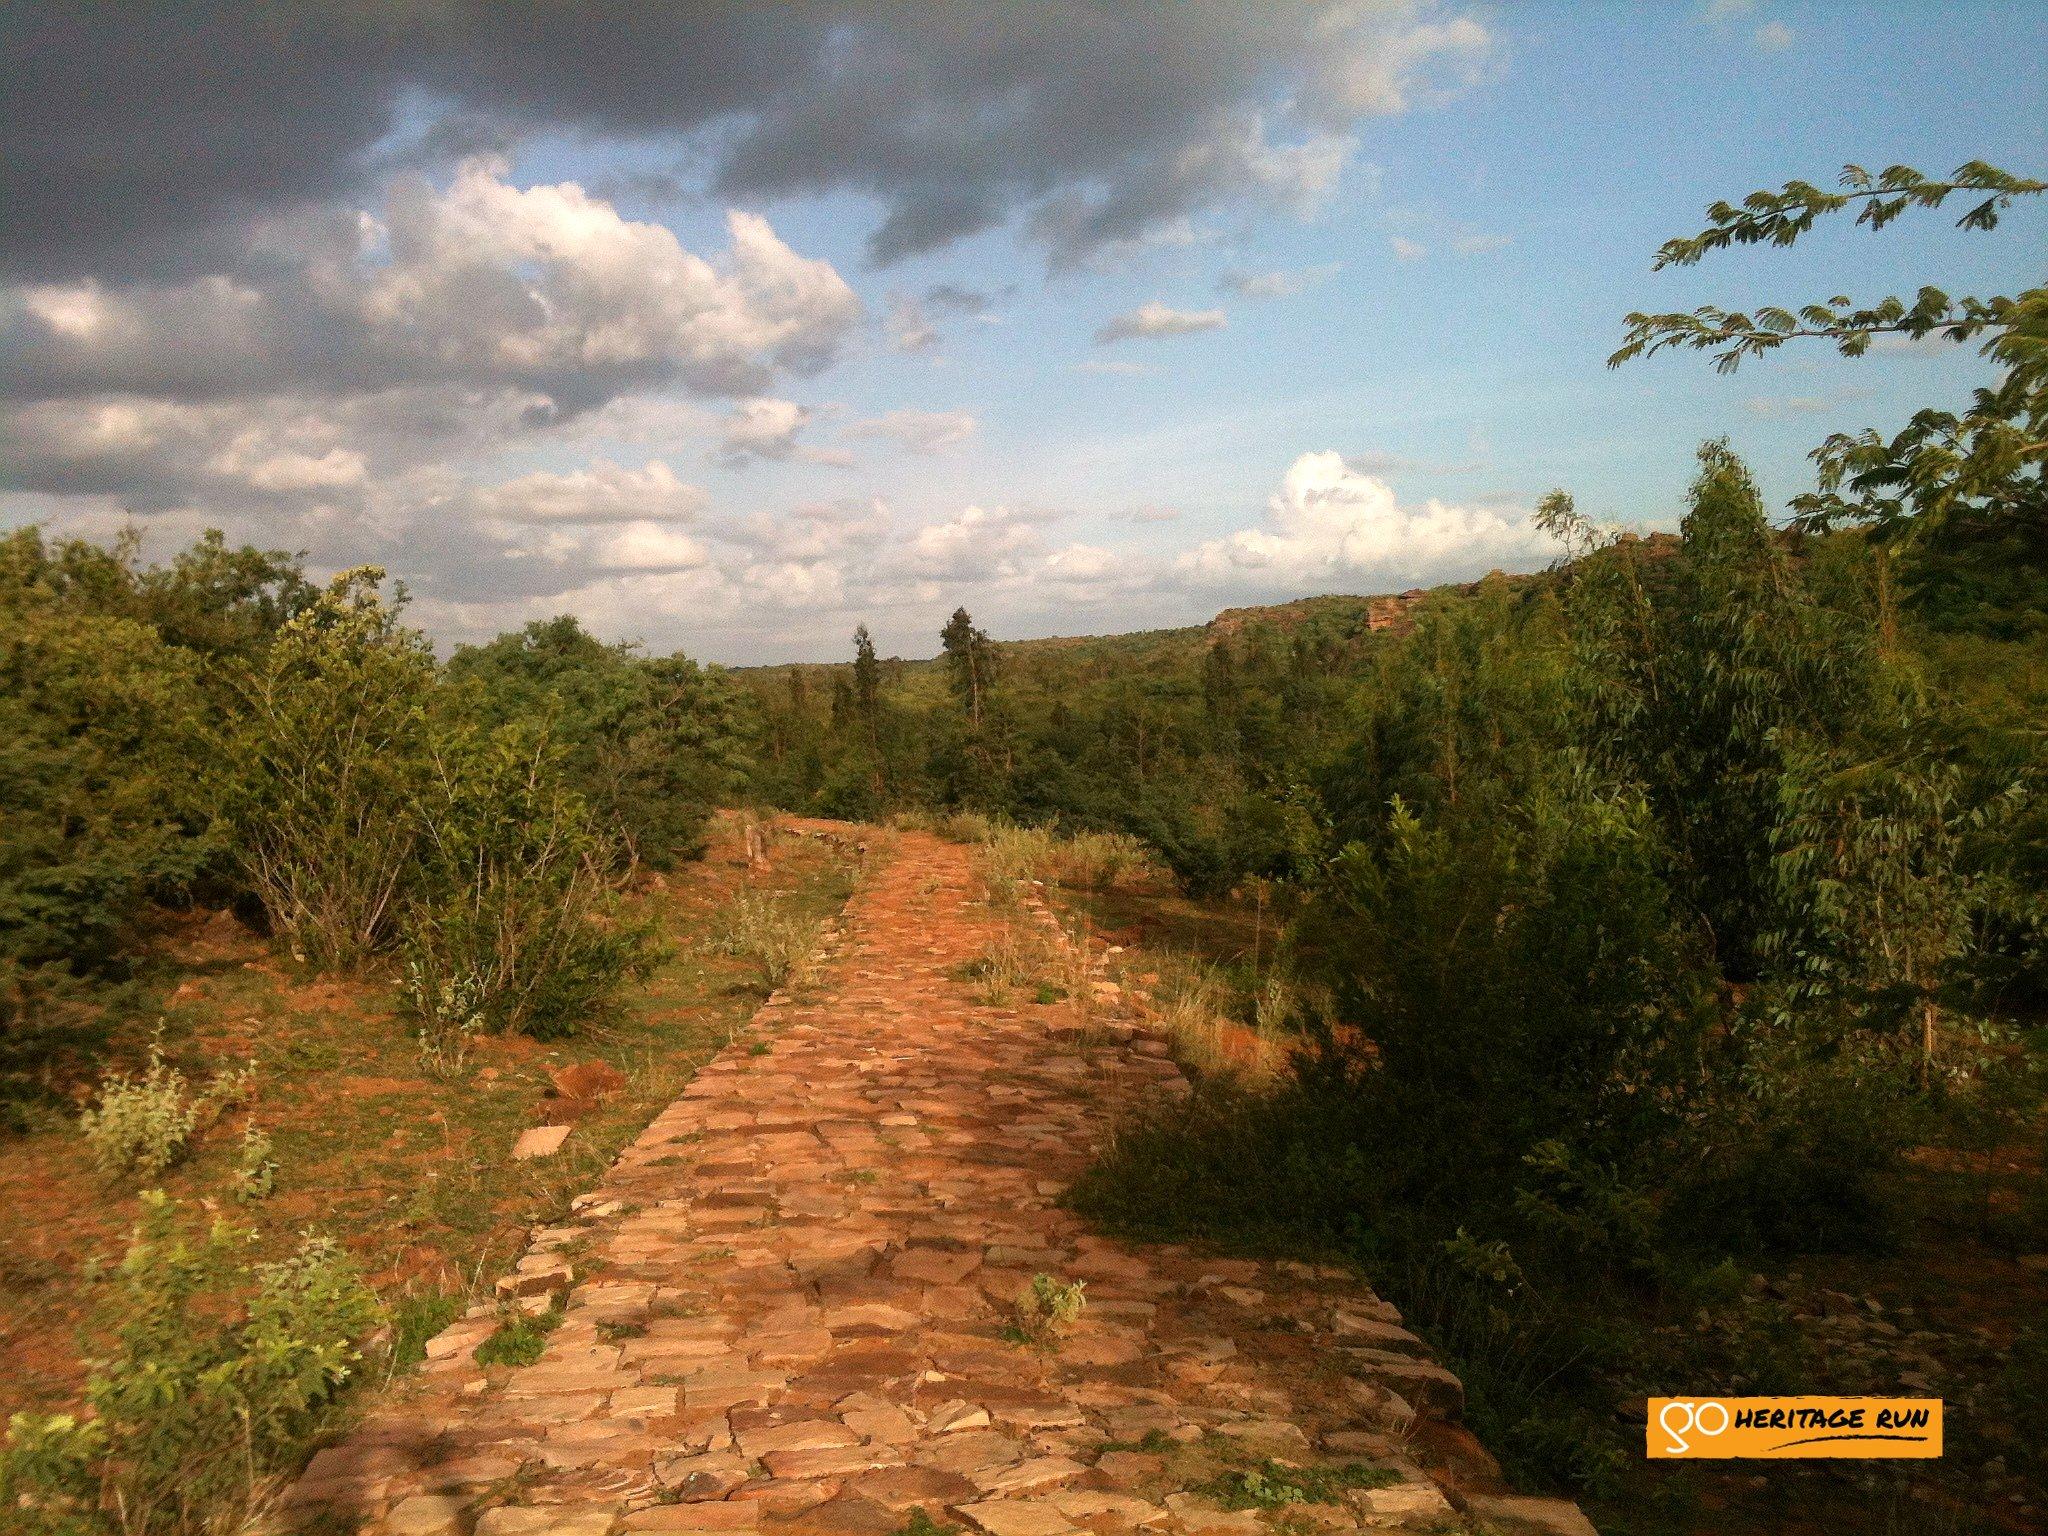 Badami Greenery on Route